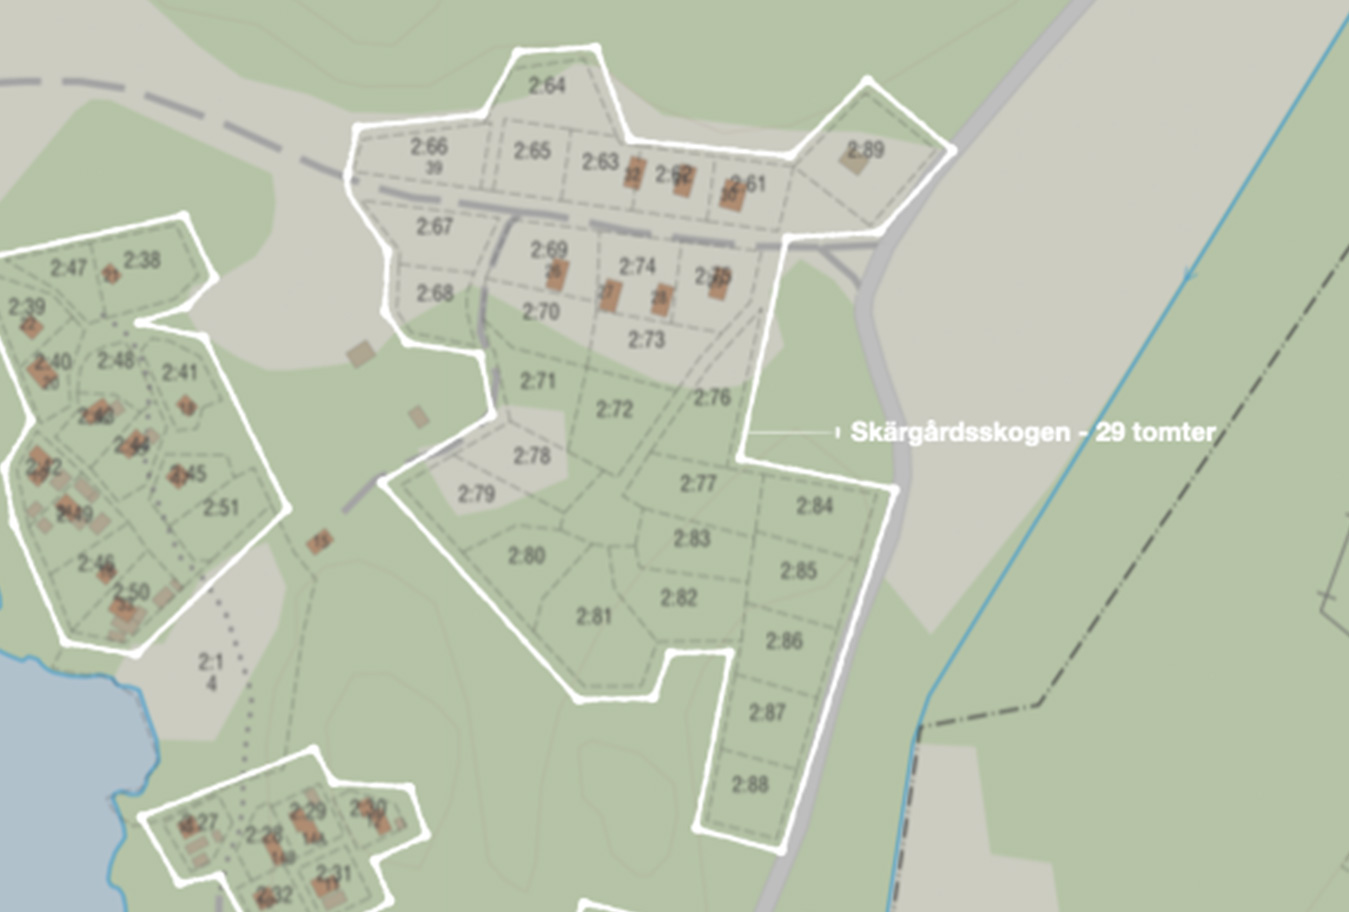 skargardsskogen-test